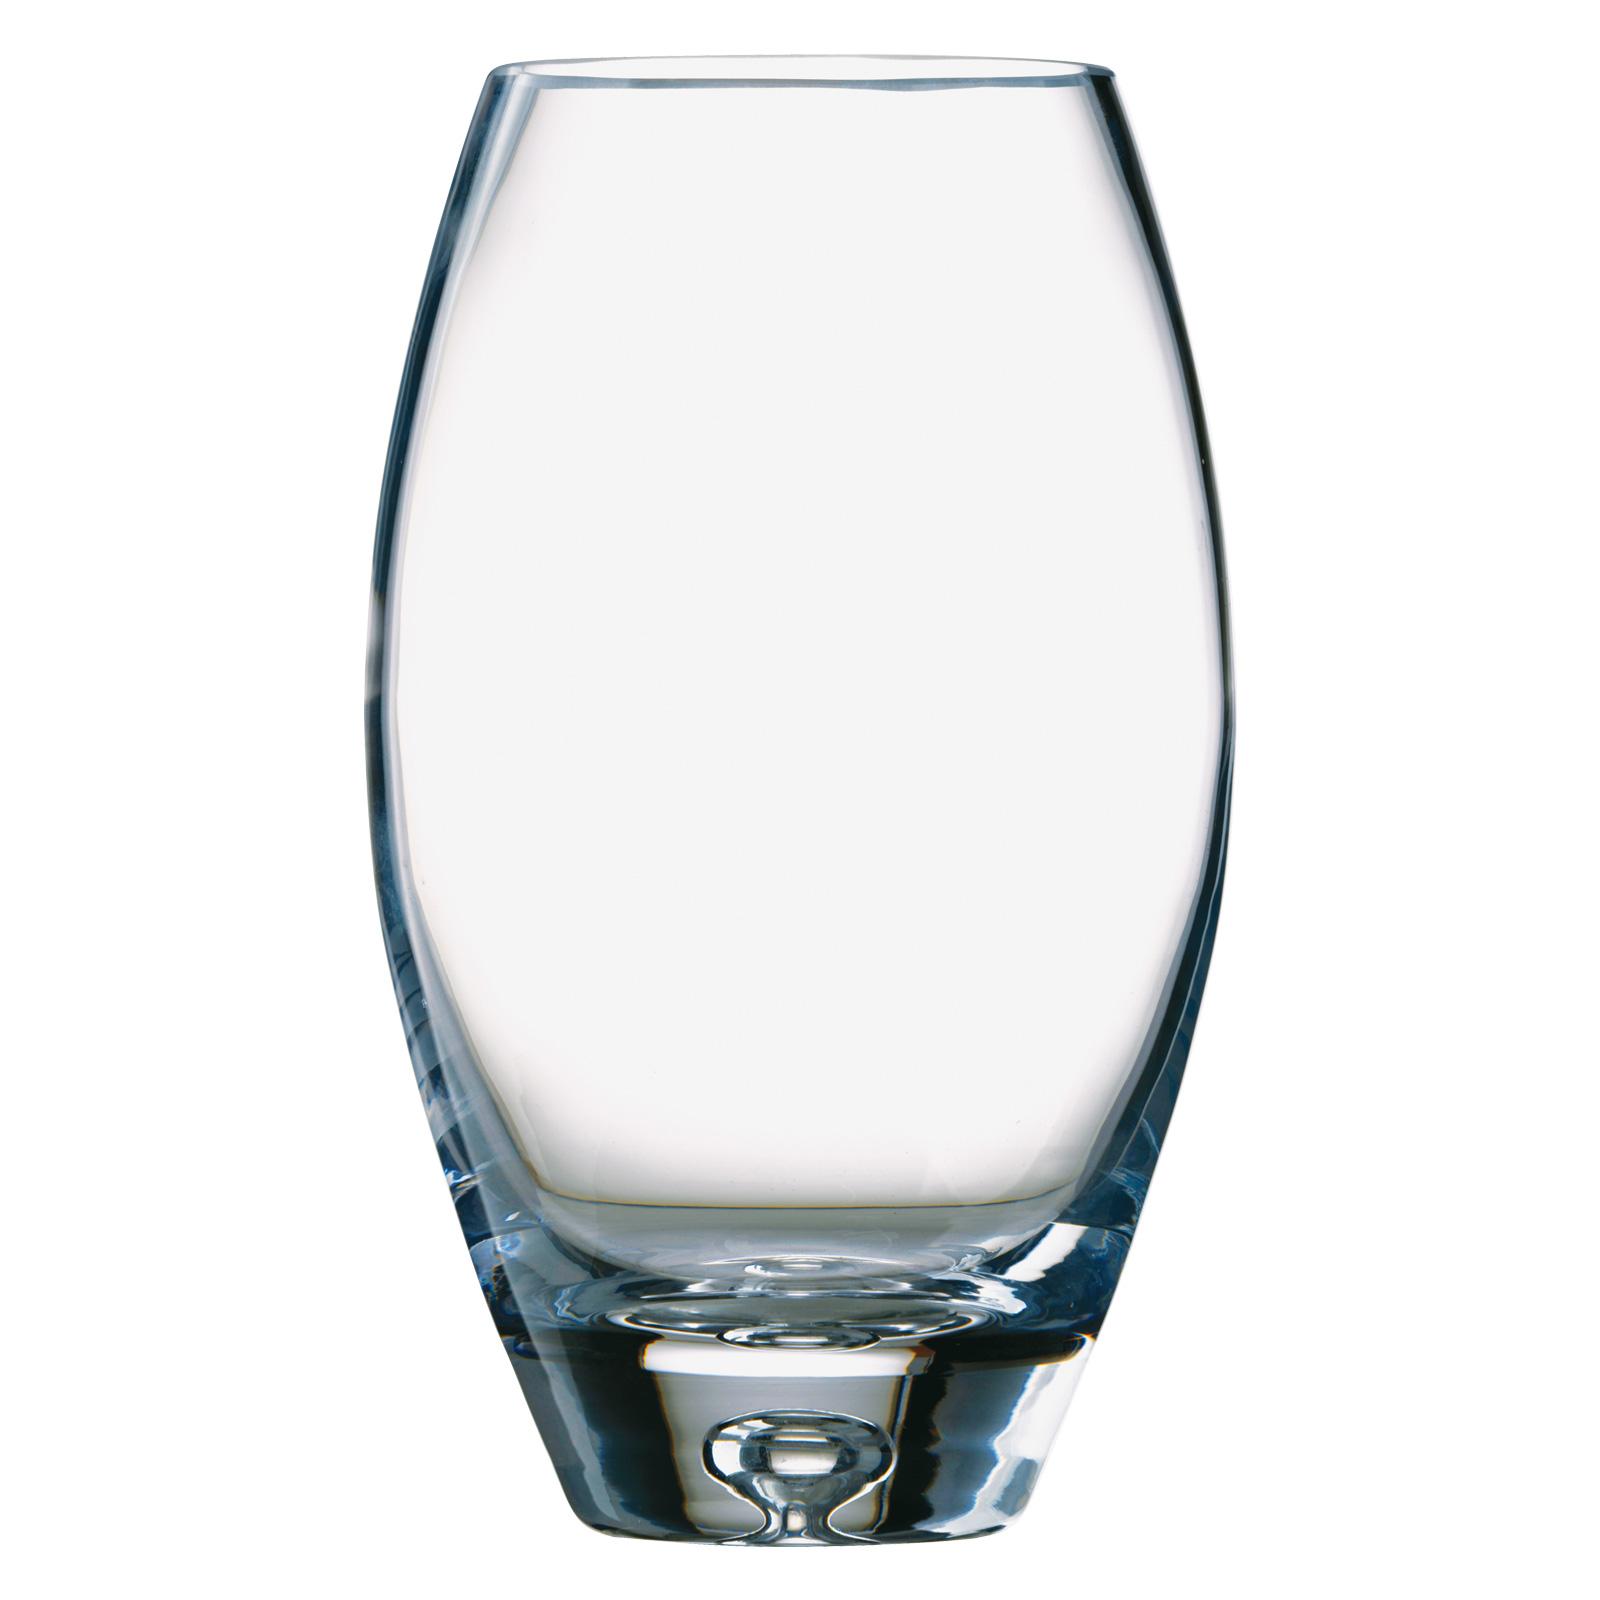 Bubble Base Barrel Vase Small by Dornberger